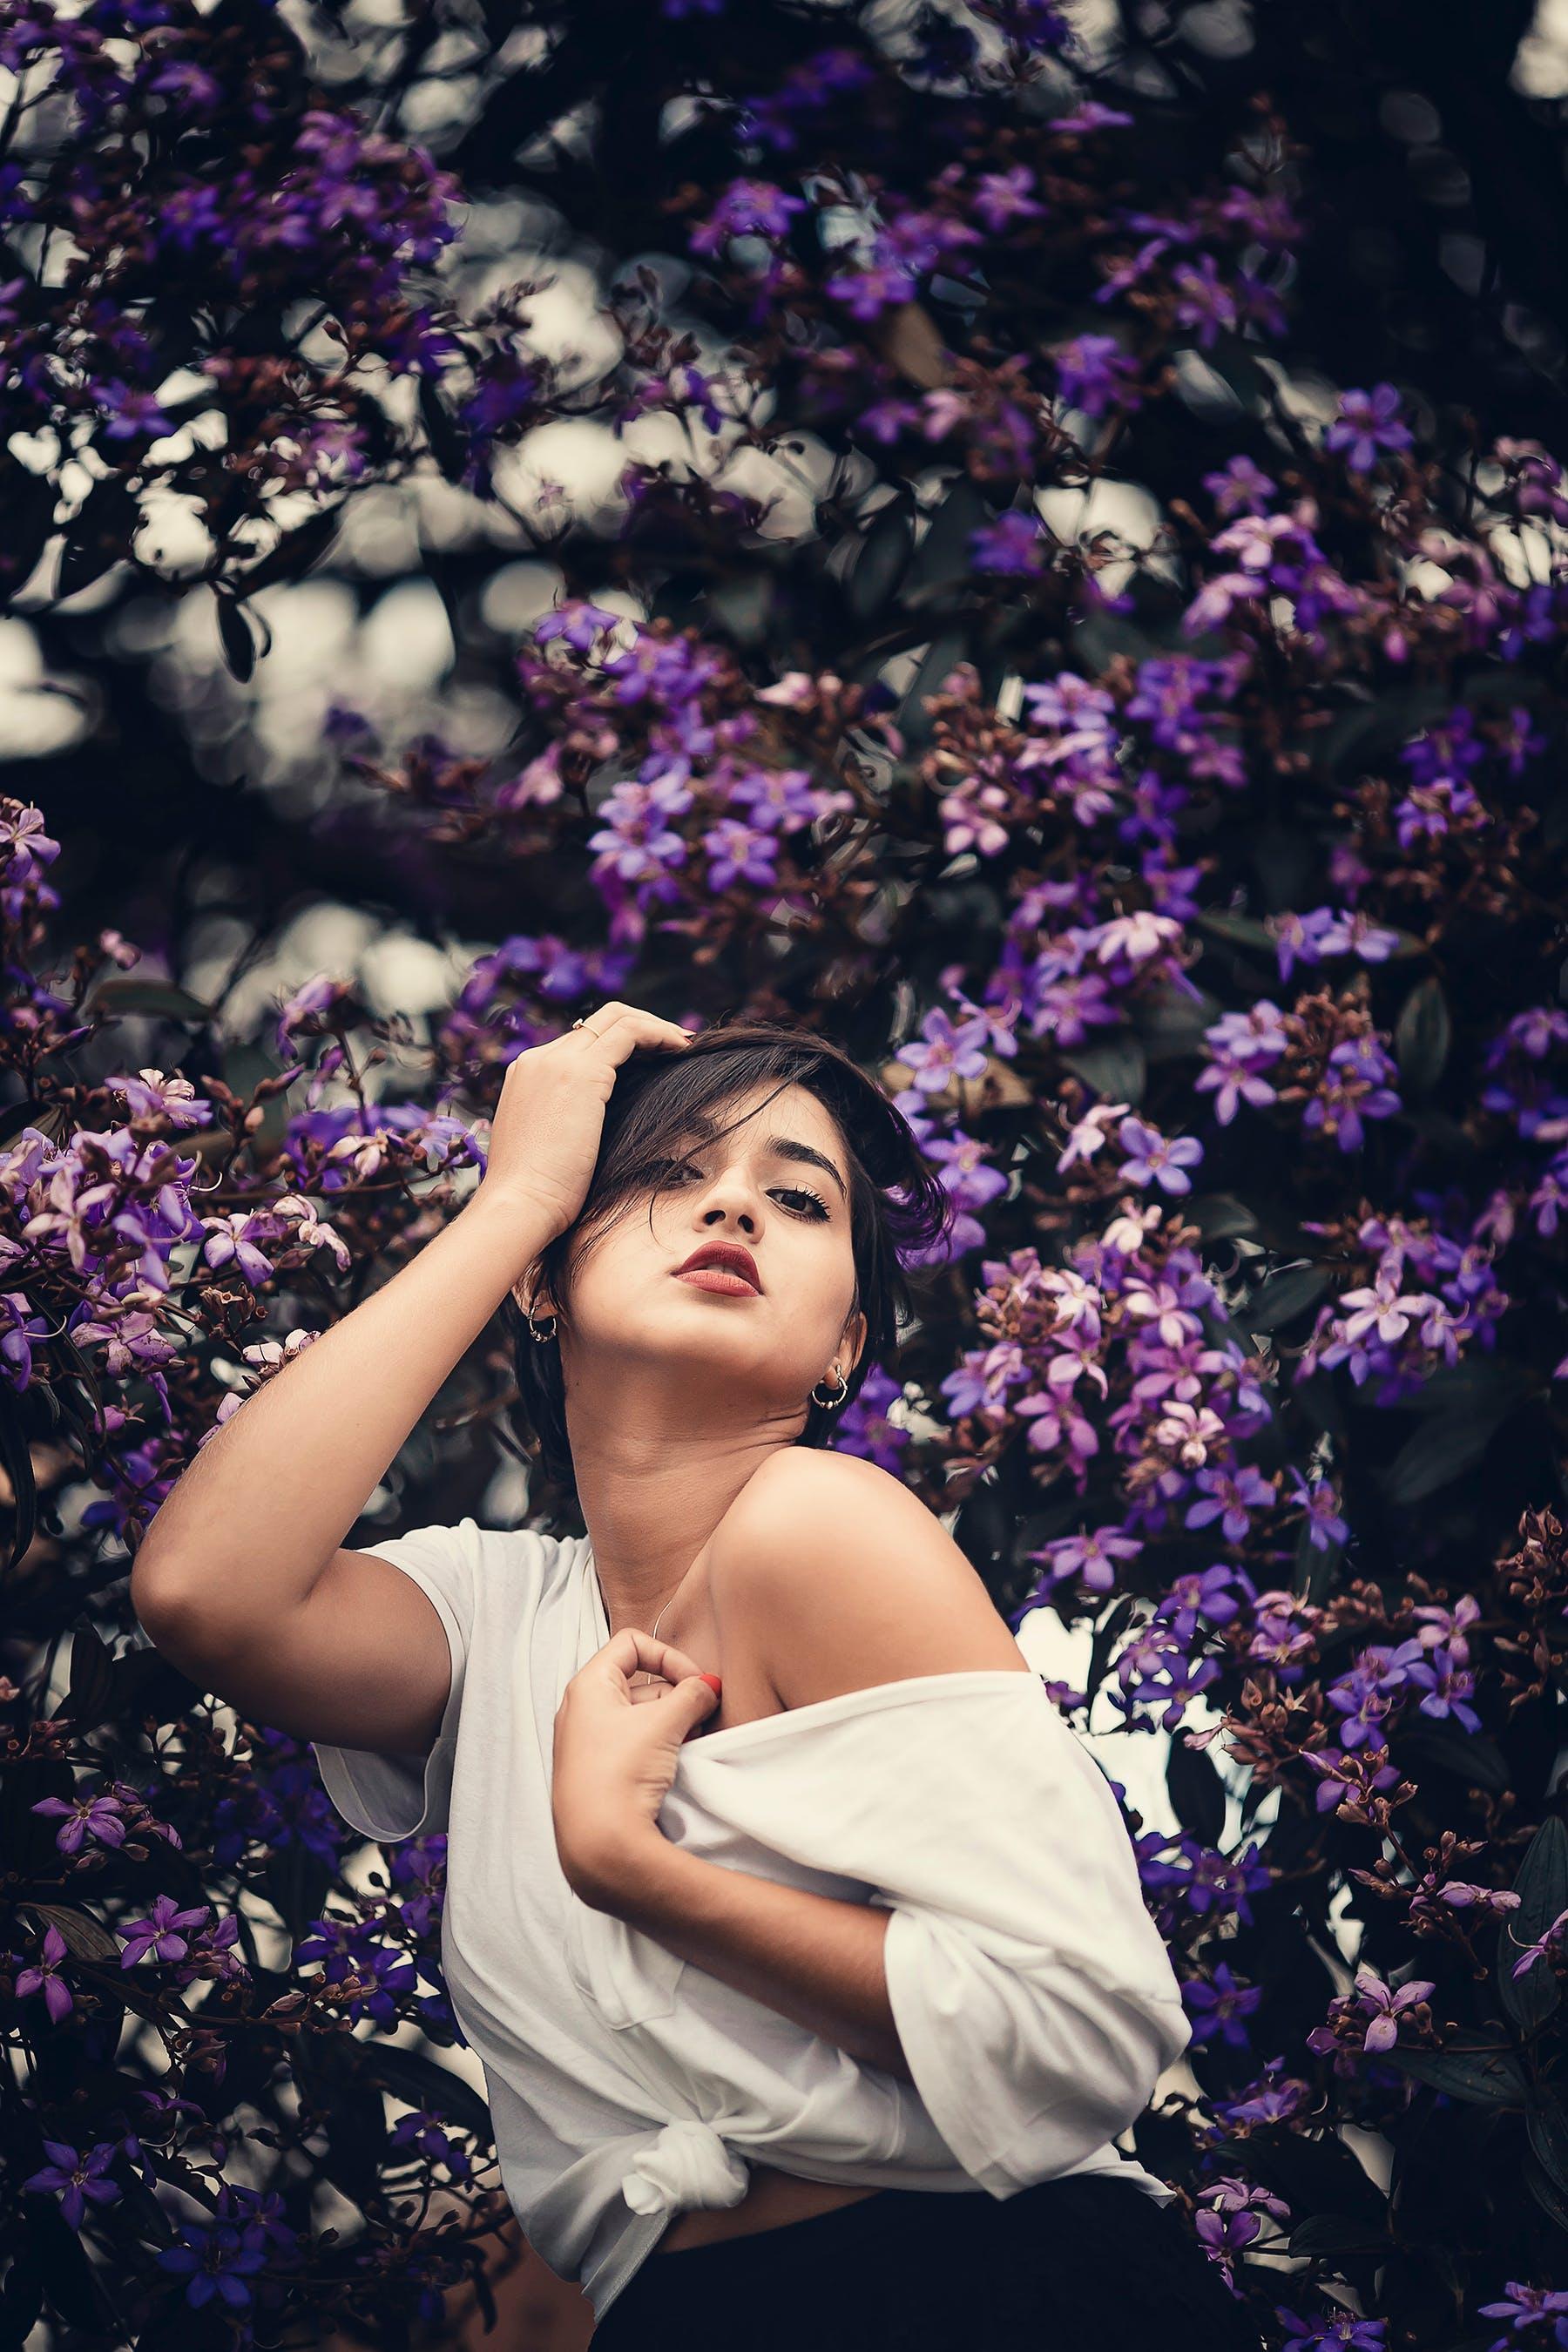 Woman Wearing White Shirt Near Purple Flowers